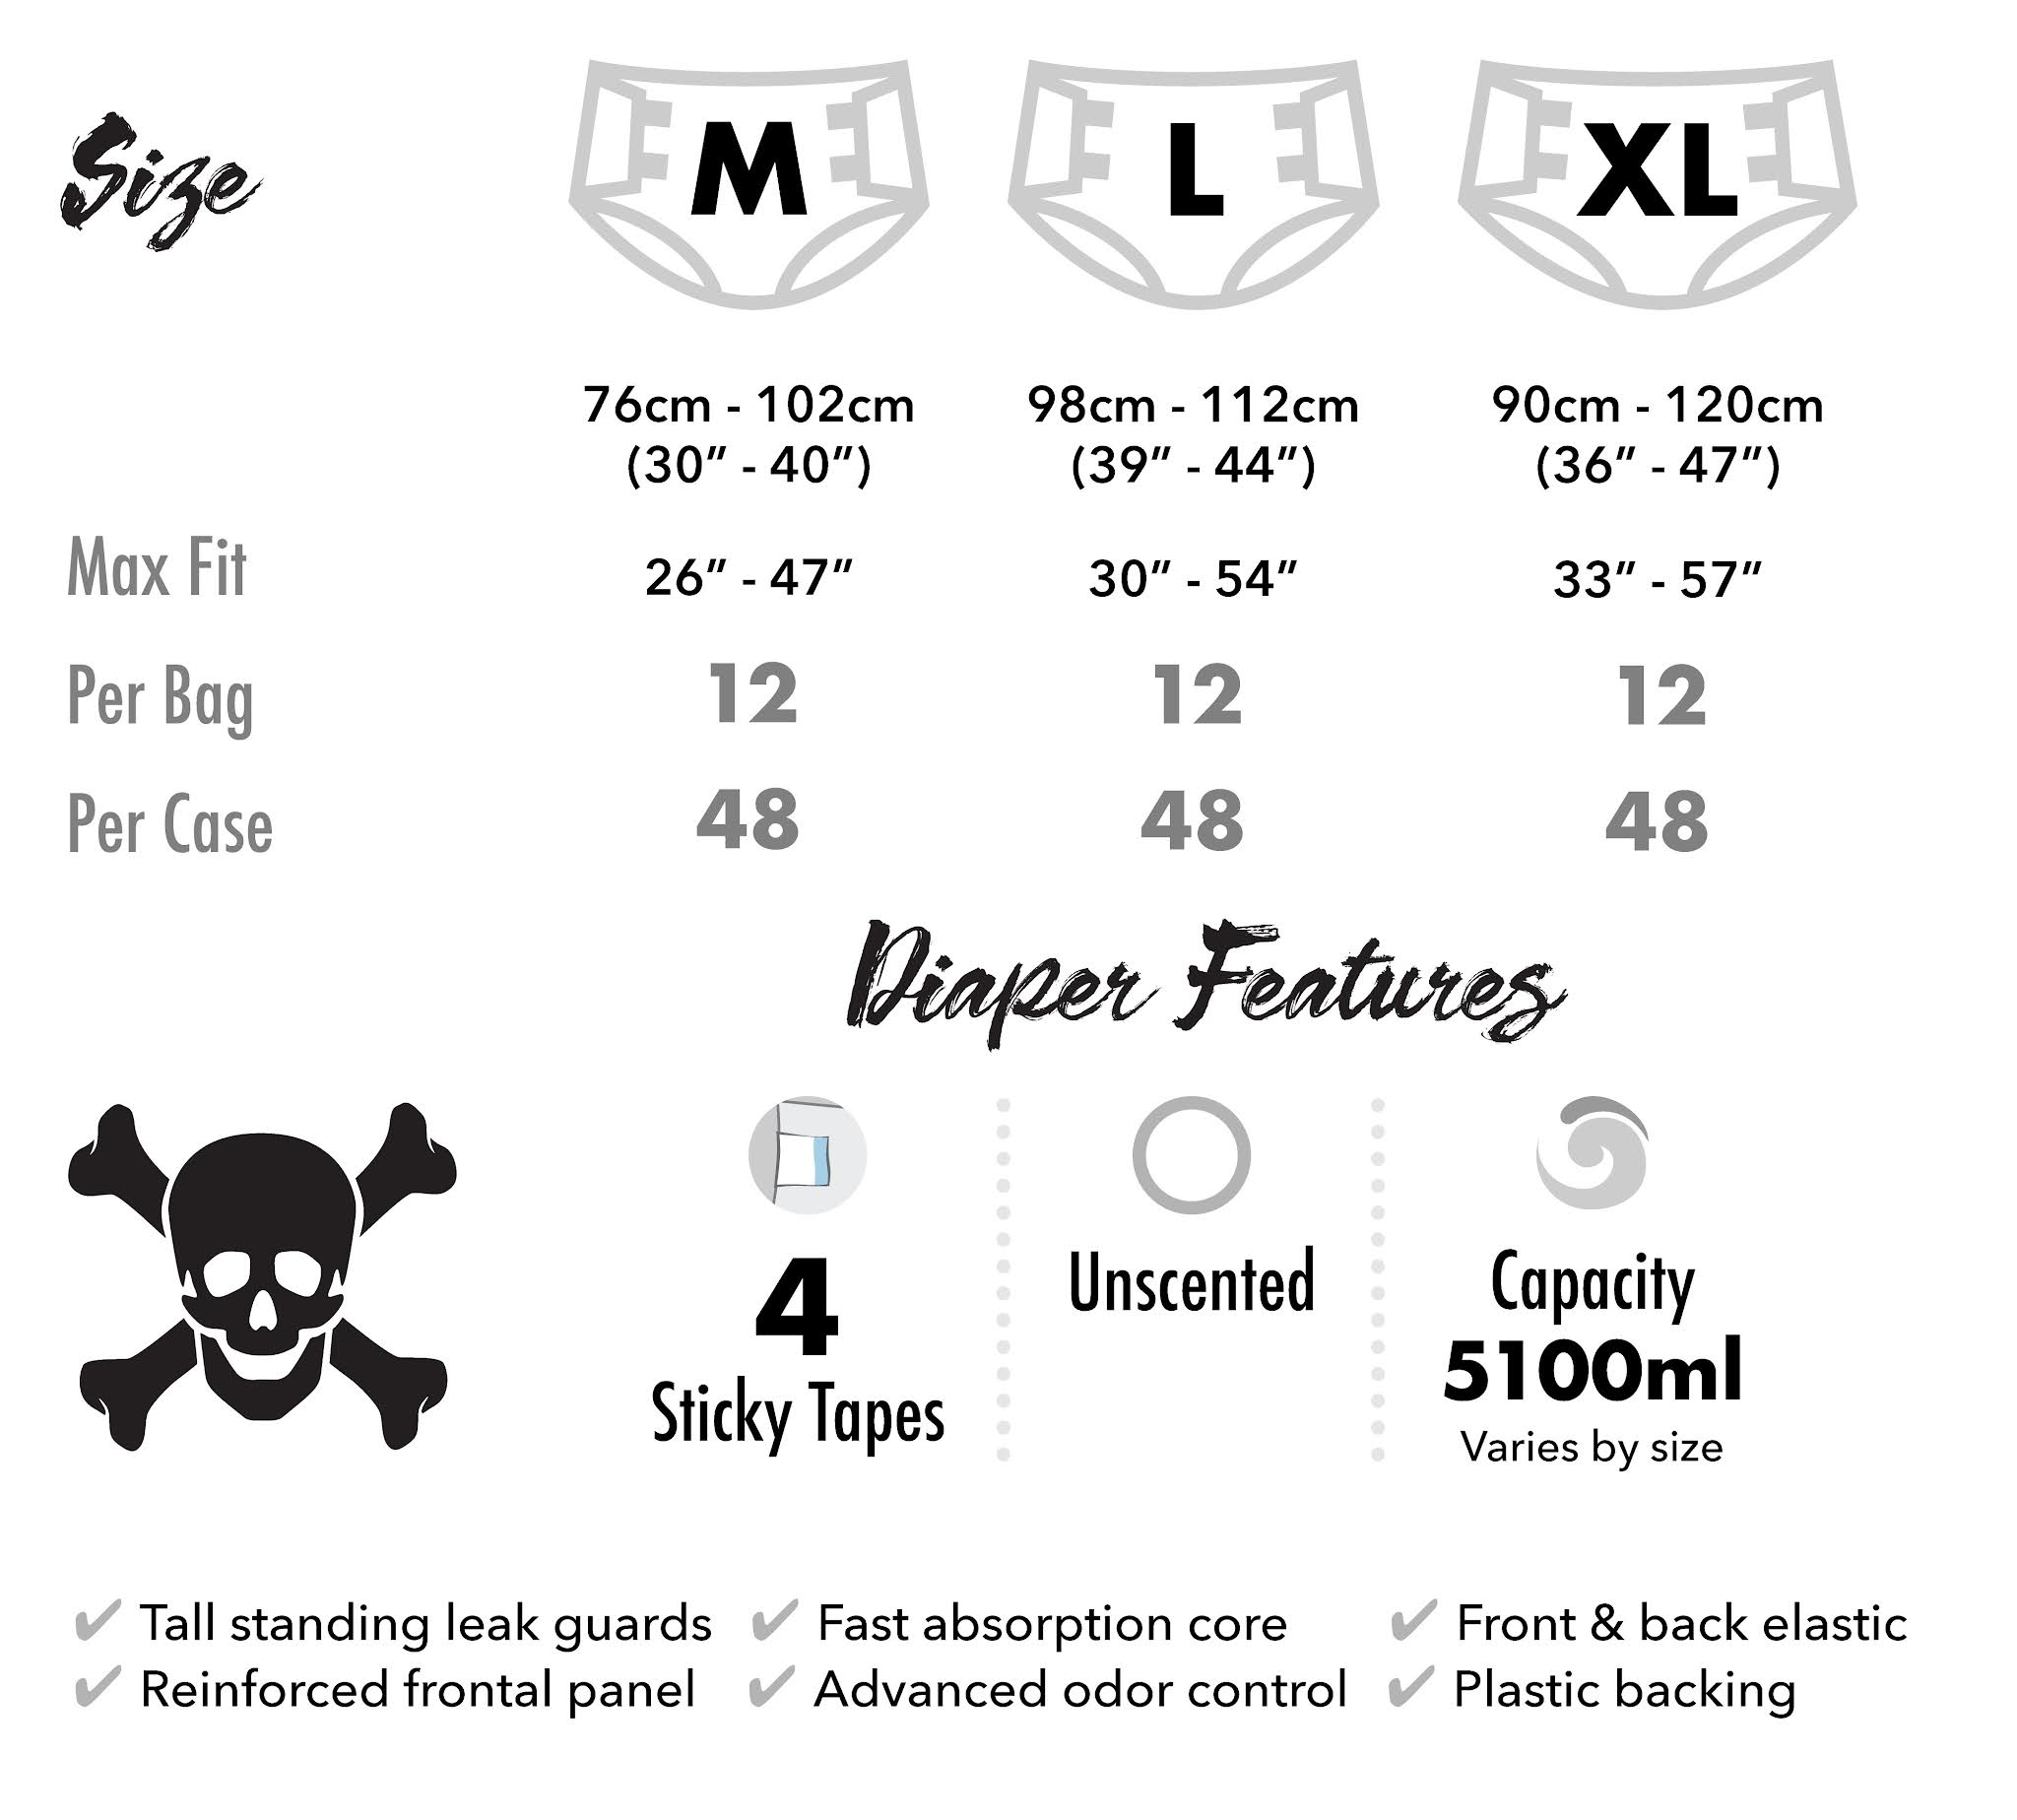 rebel-infographic-xlfixed.jpg